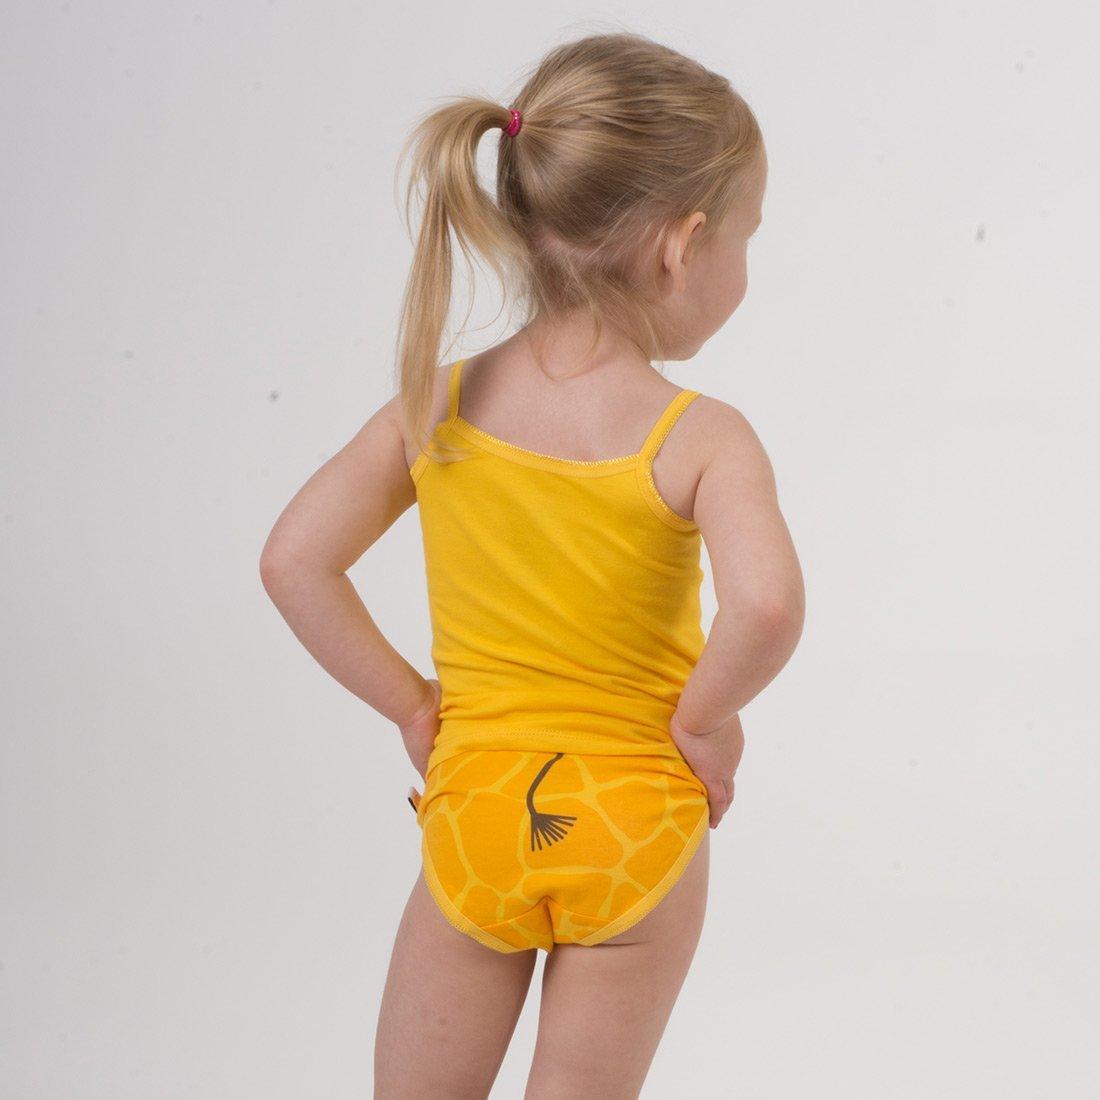 Ensemble fille débardeur/culotte Girafe/jaune